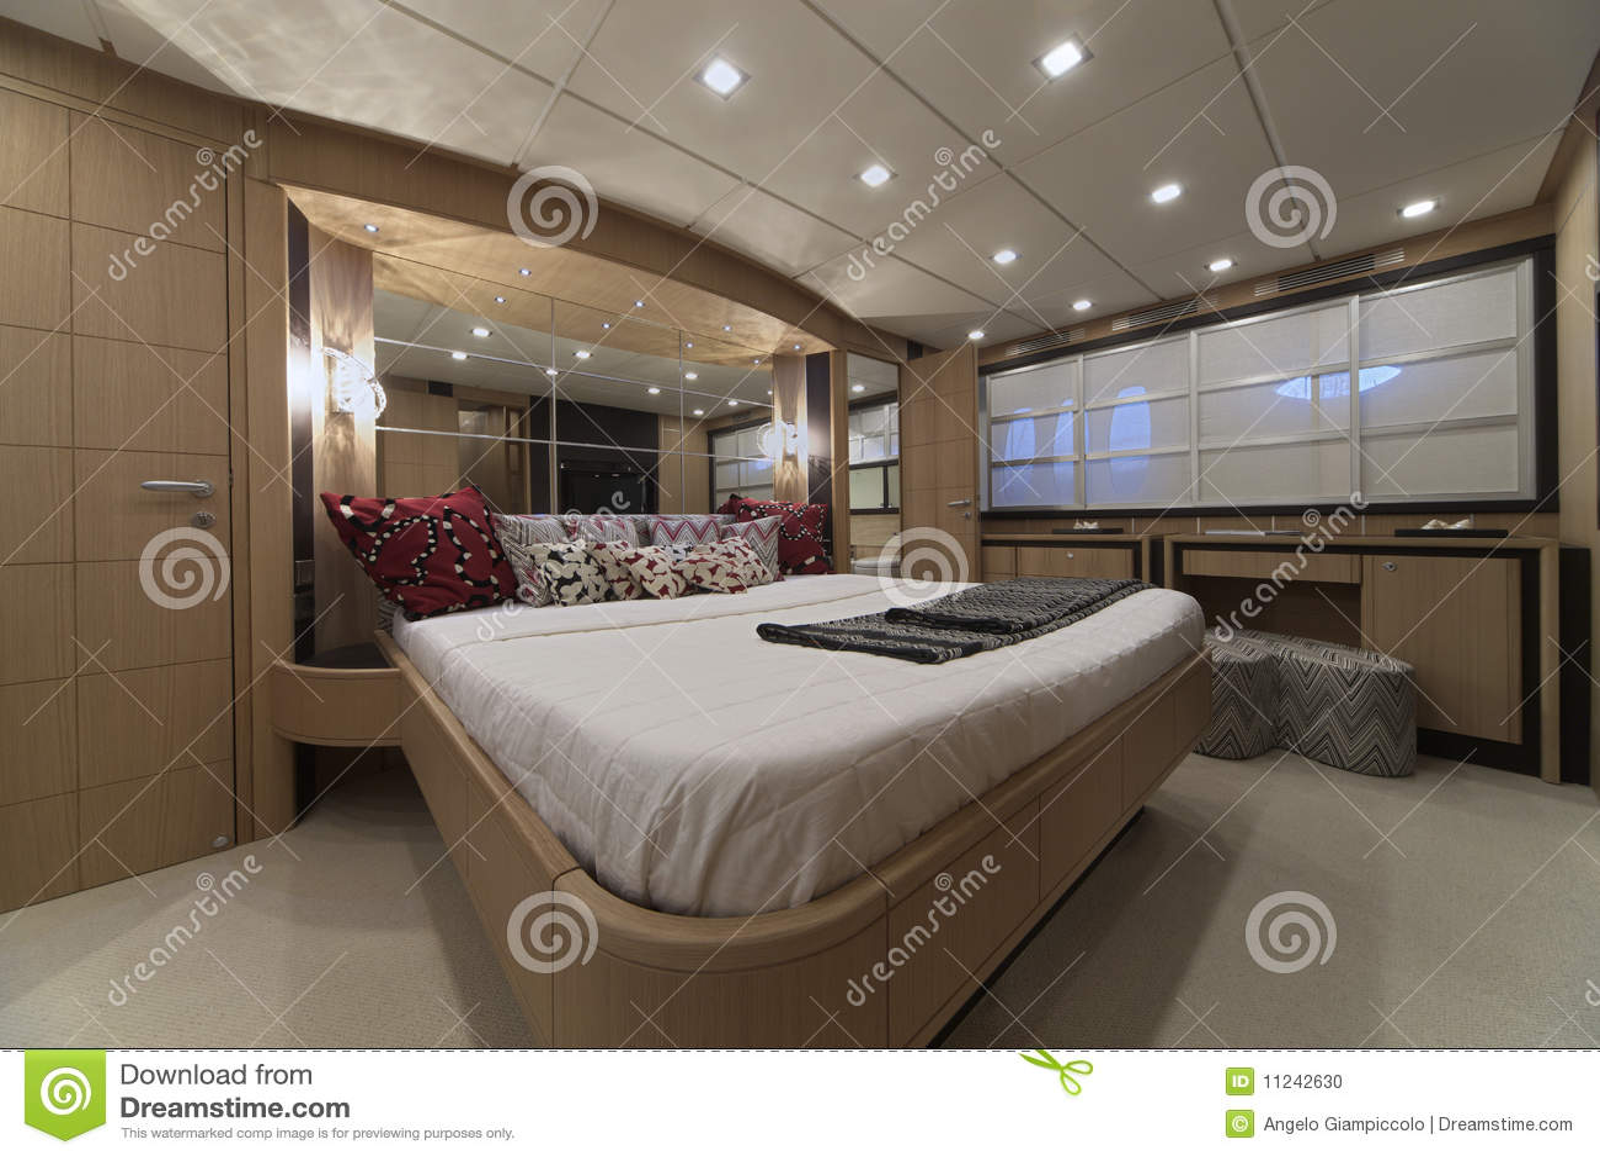 Bedroom Yacht Stock Image - Image: 26710871